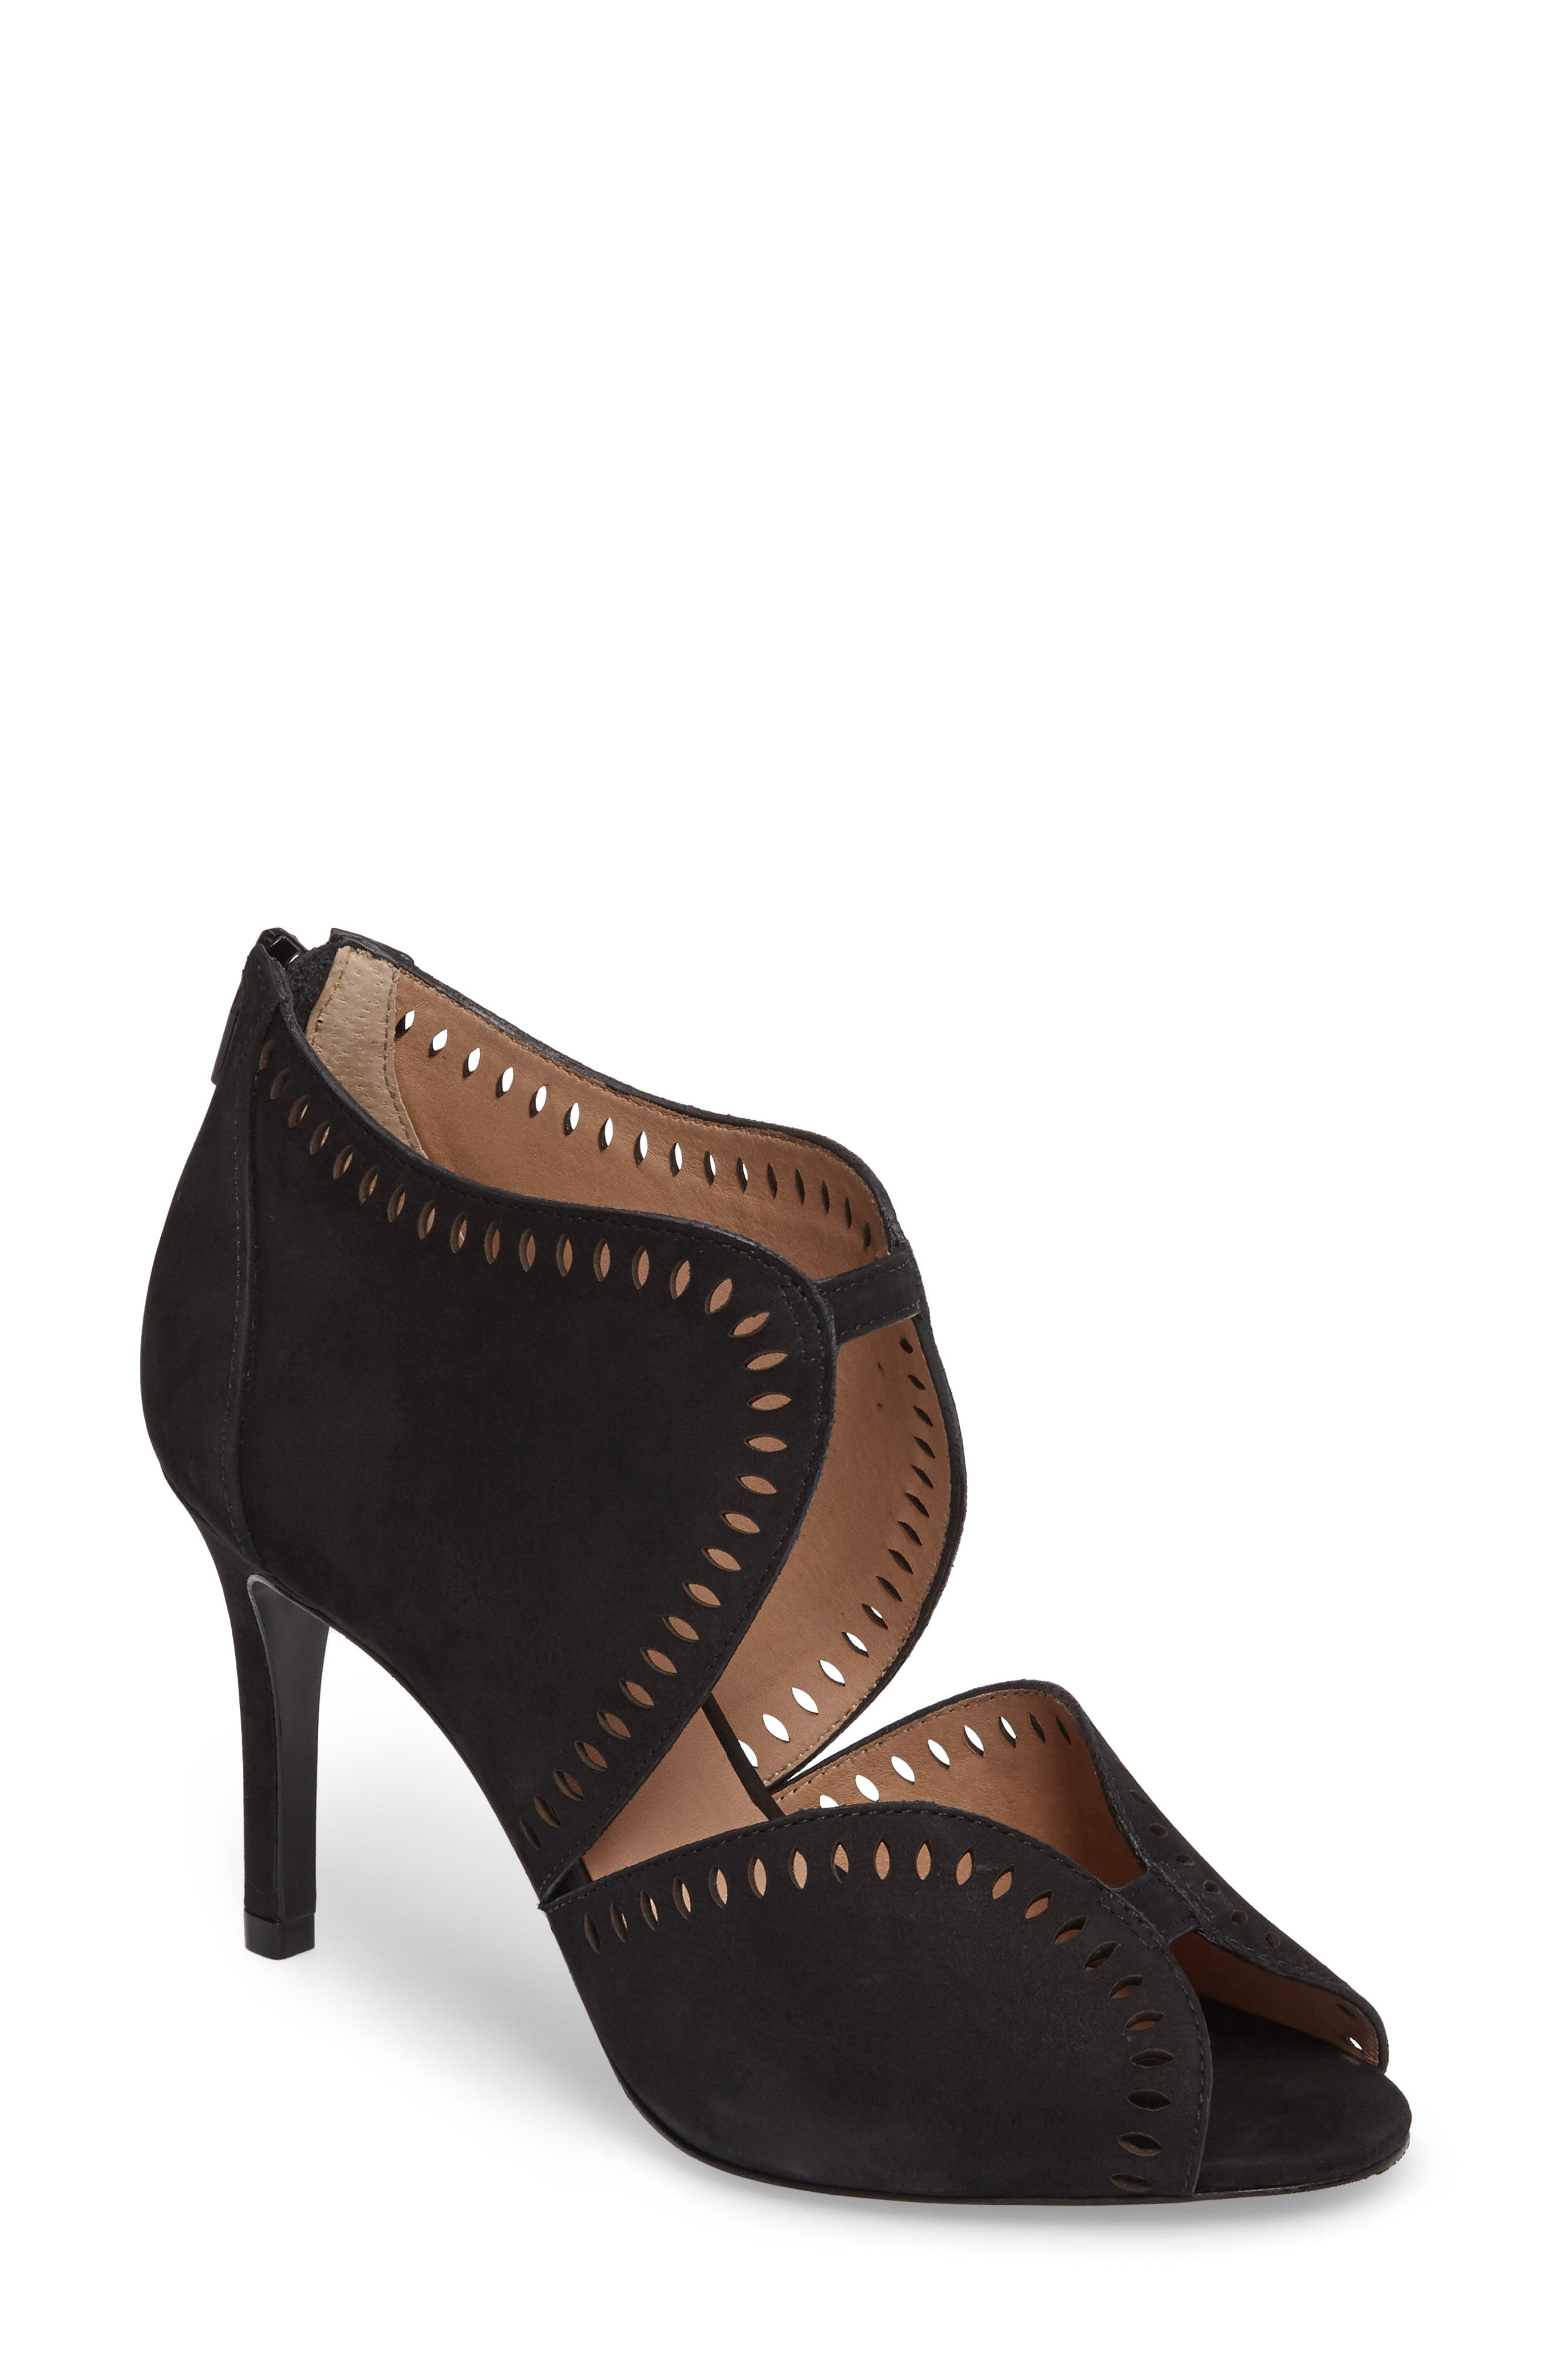 Mallia Perforated Sandal,                             Main thumbnail 1, color,                             001